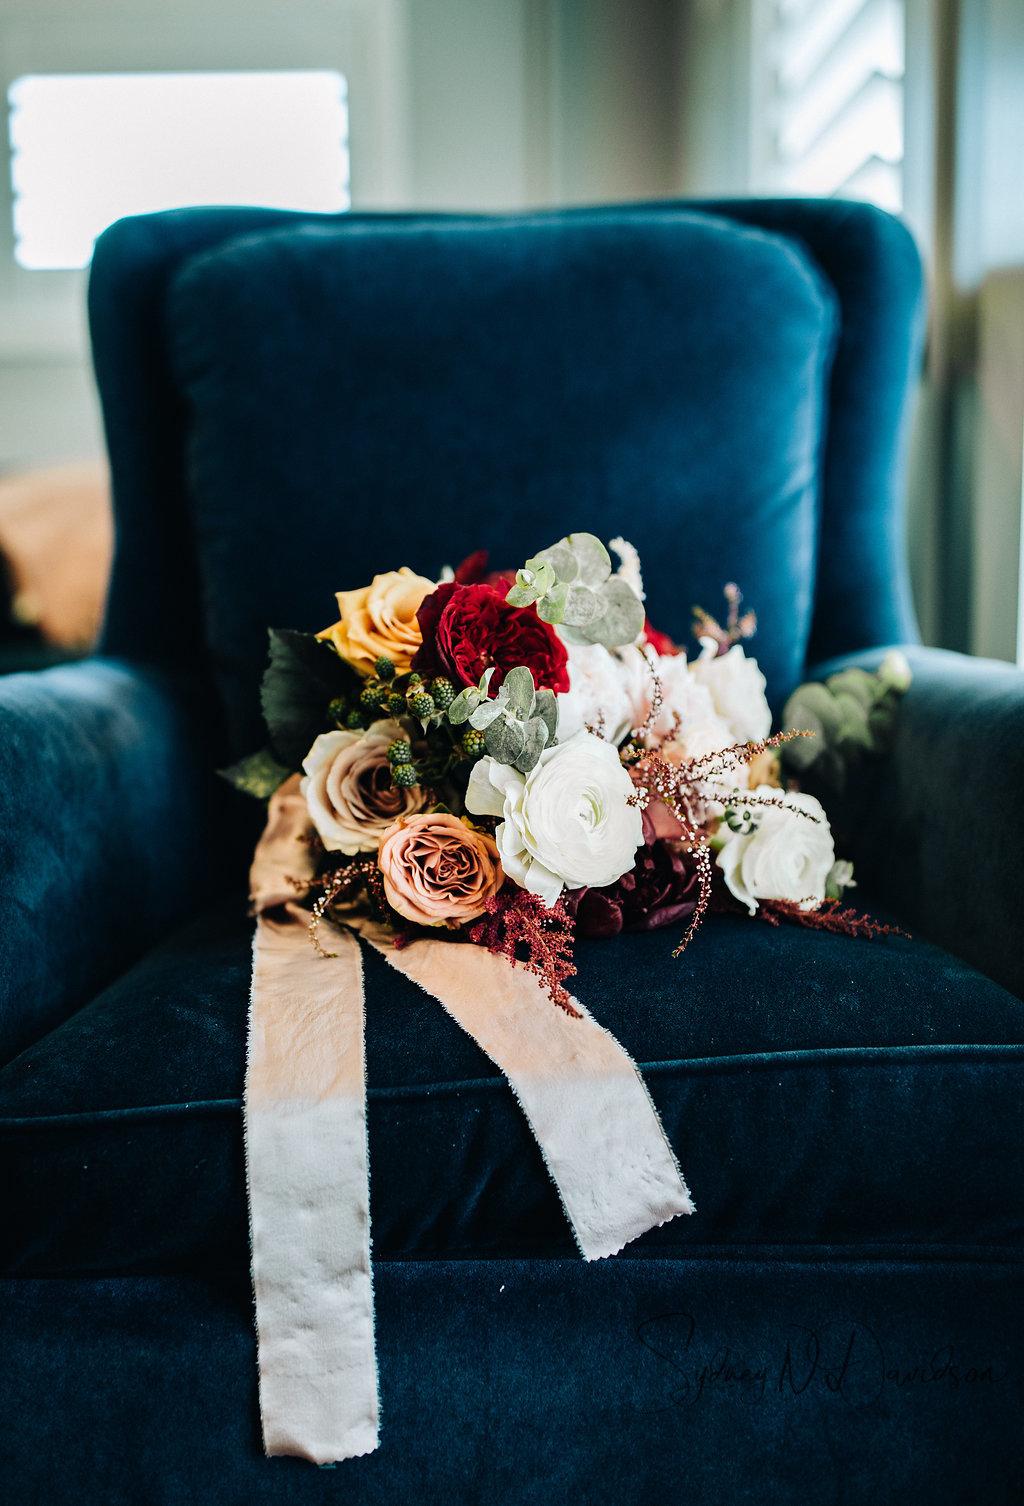 sydney-davidson-wedding-stillwater-oklahoma-wedding-session-traveling-photographer-portrait-tulsa-oklahoma-1439.jpg